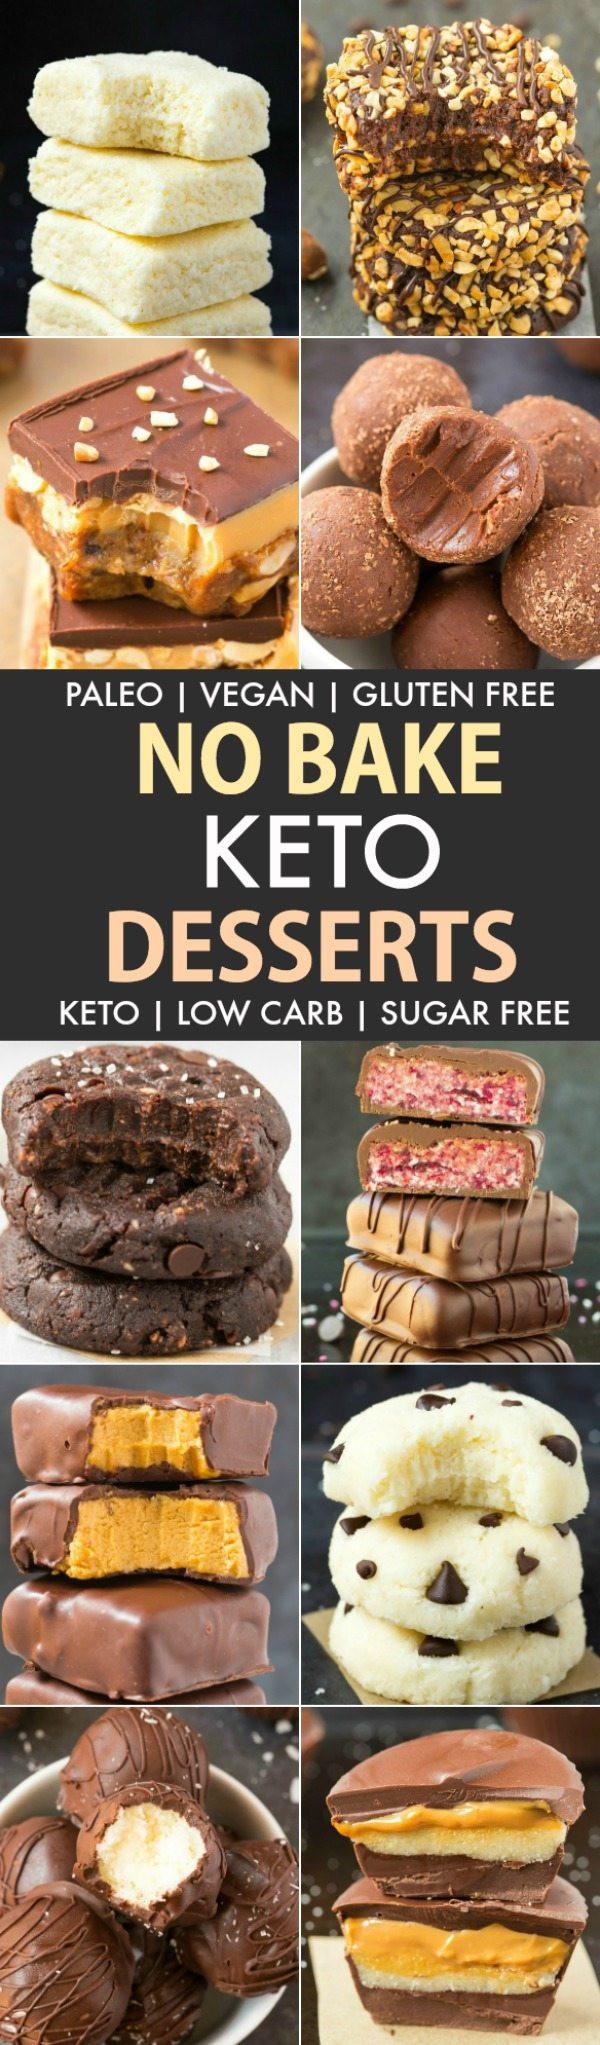 Quick And Easy Keto Desserts  Easy No Bake Low Carb Keto Desserts Paleo Vegan